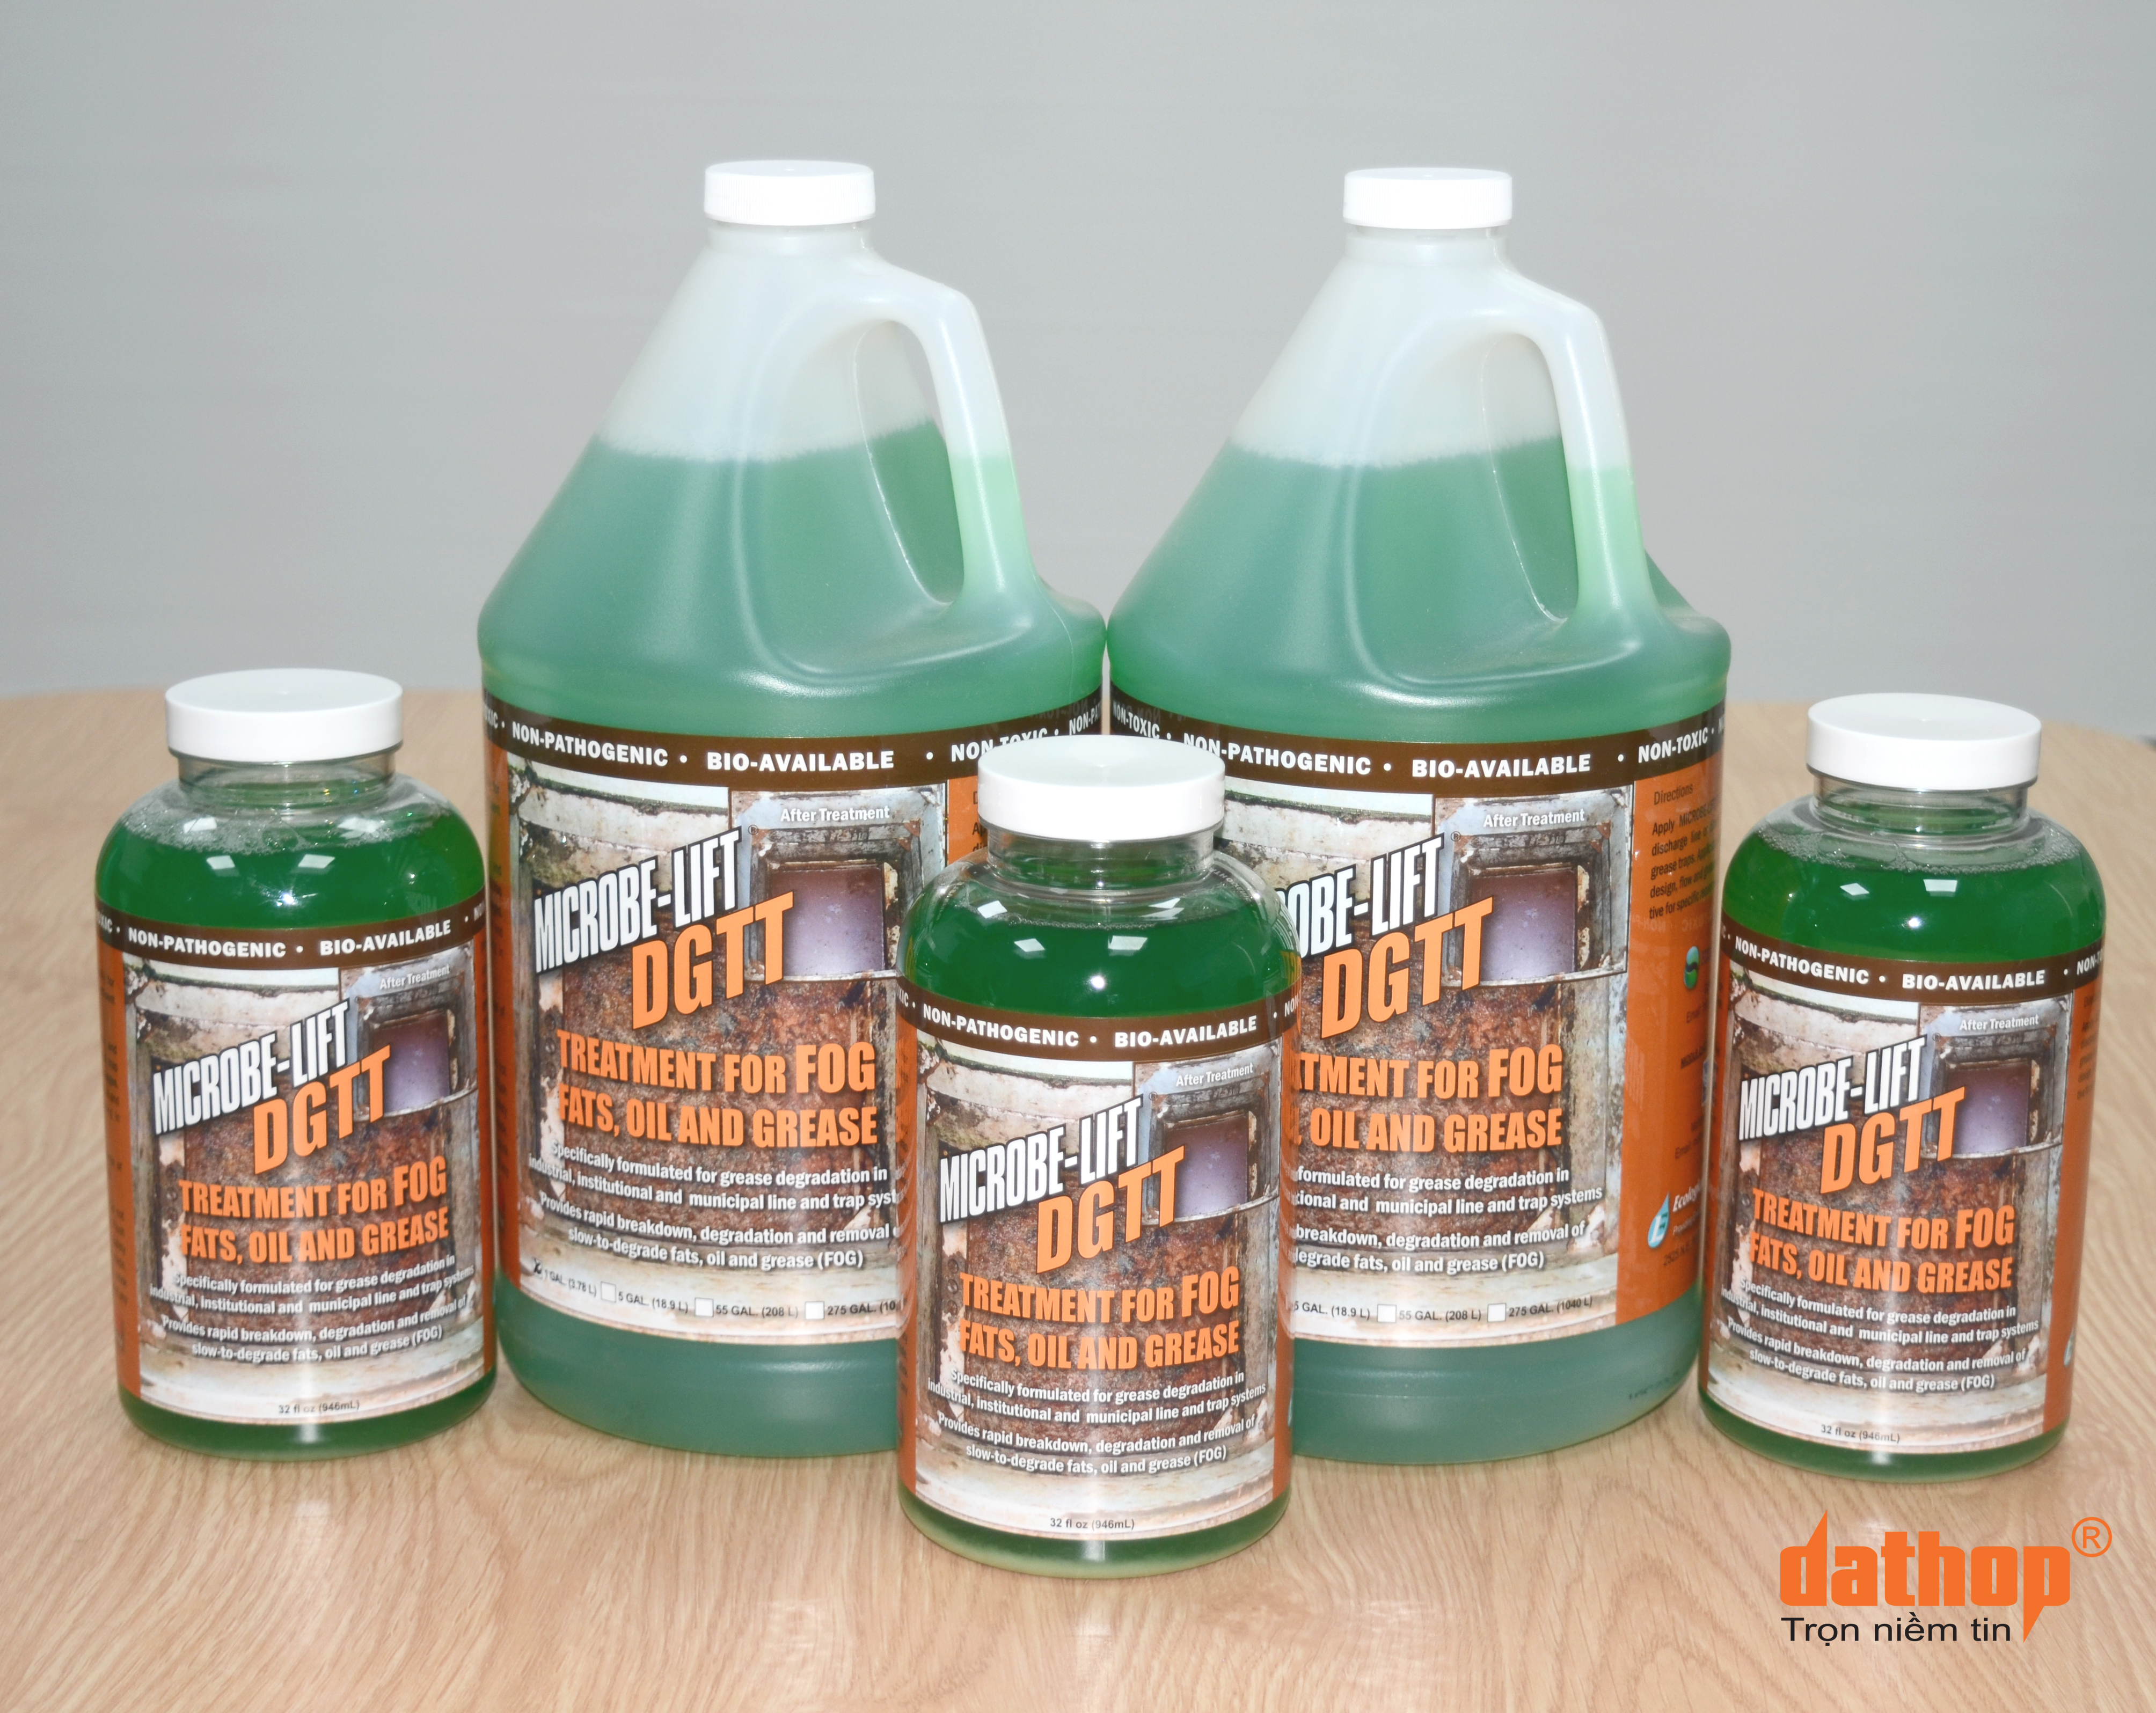 sản phẩm microbe-lift DGTT